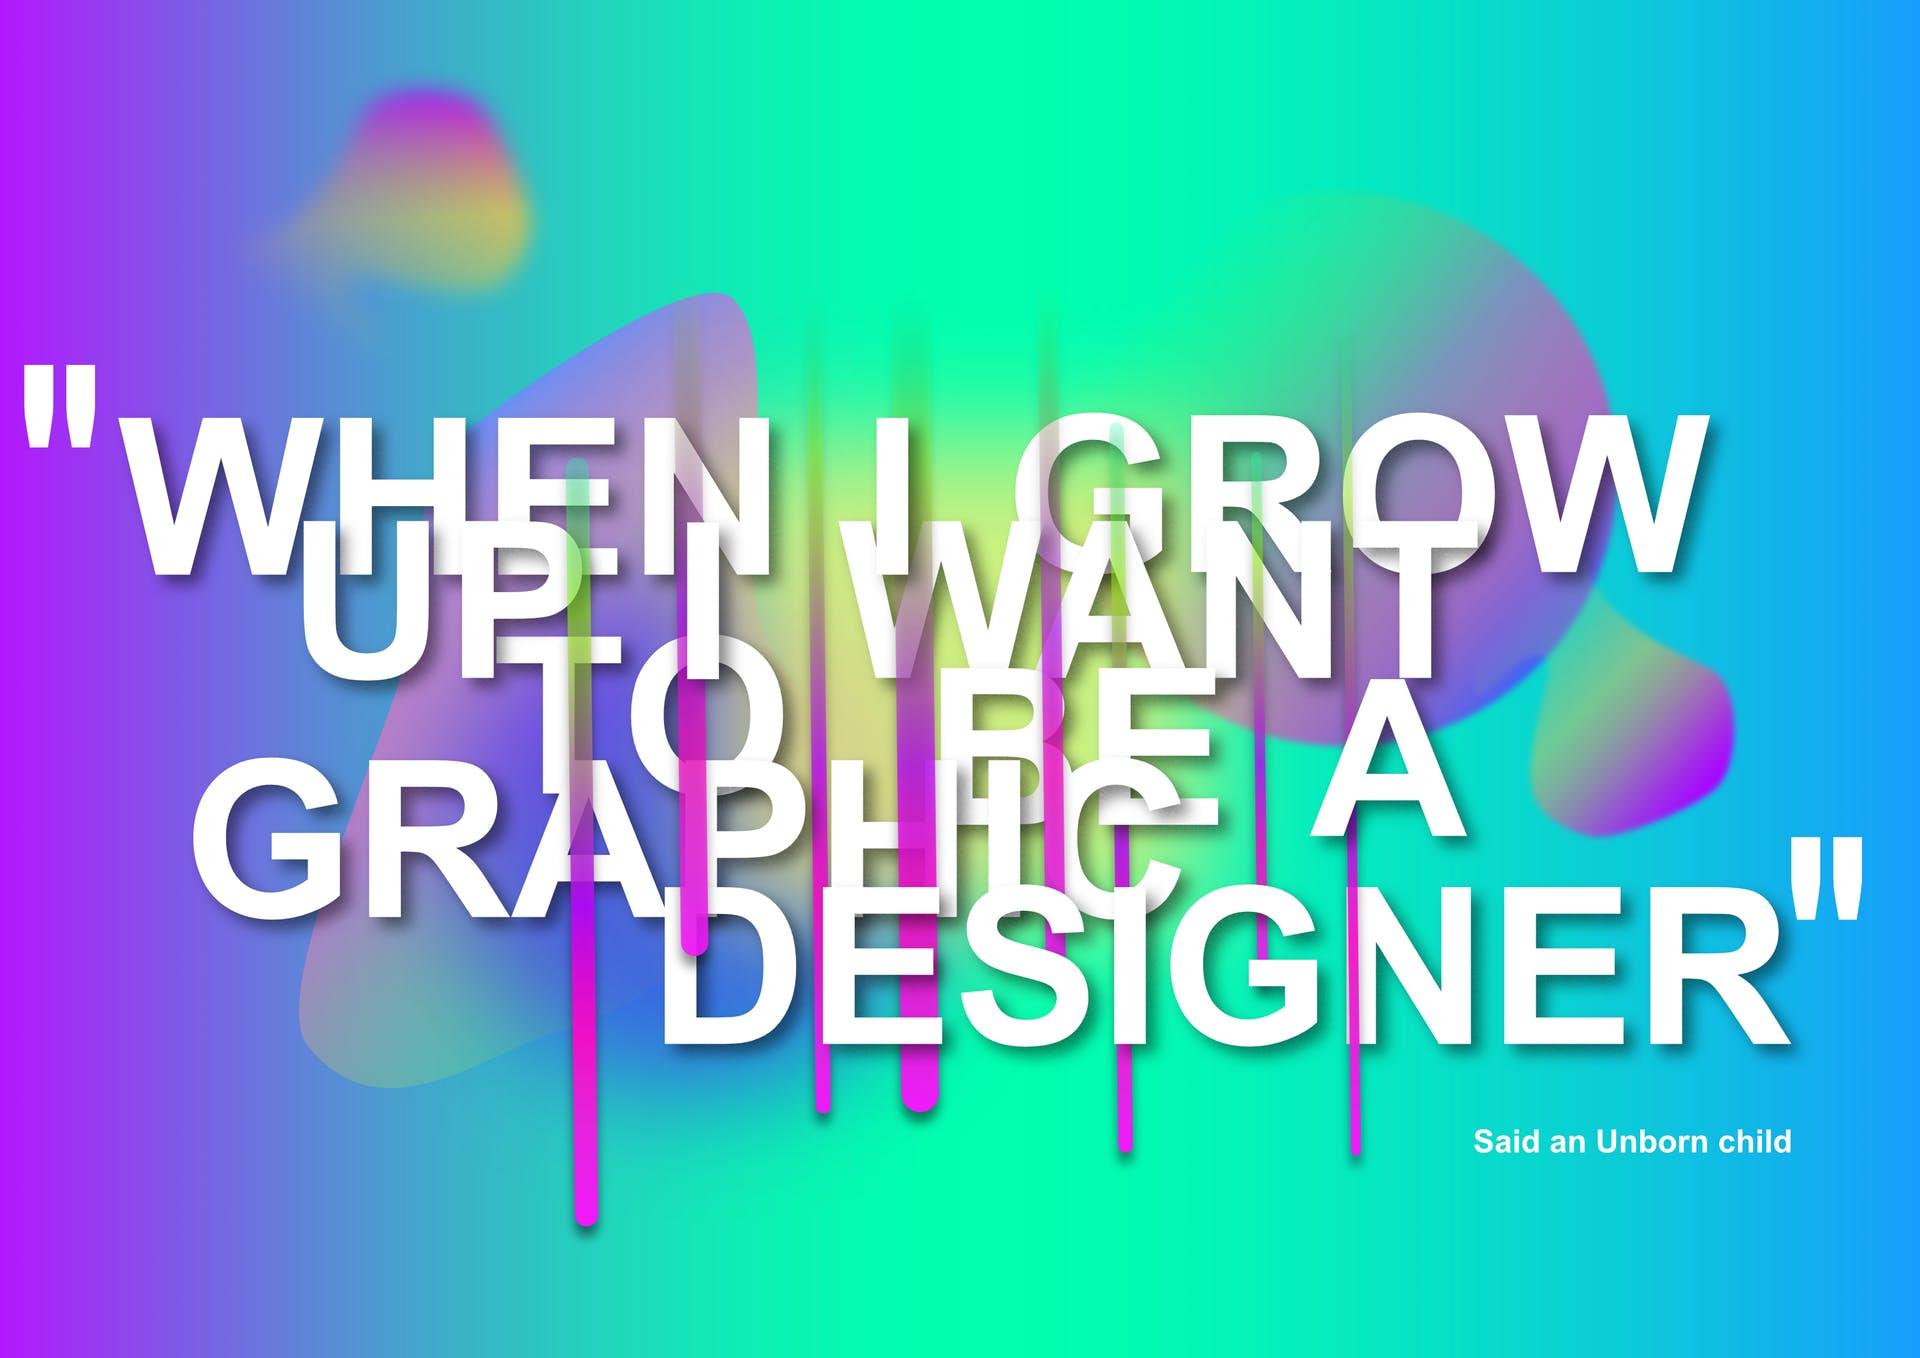 graphic design posters design poster quote quotes